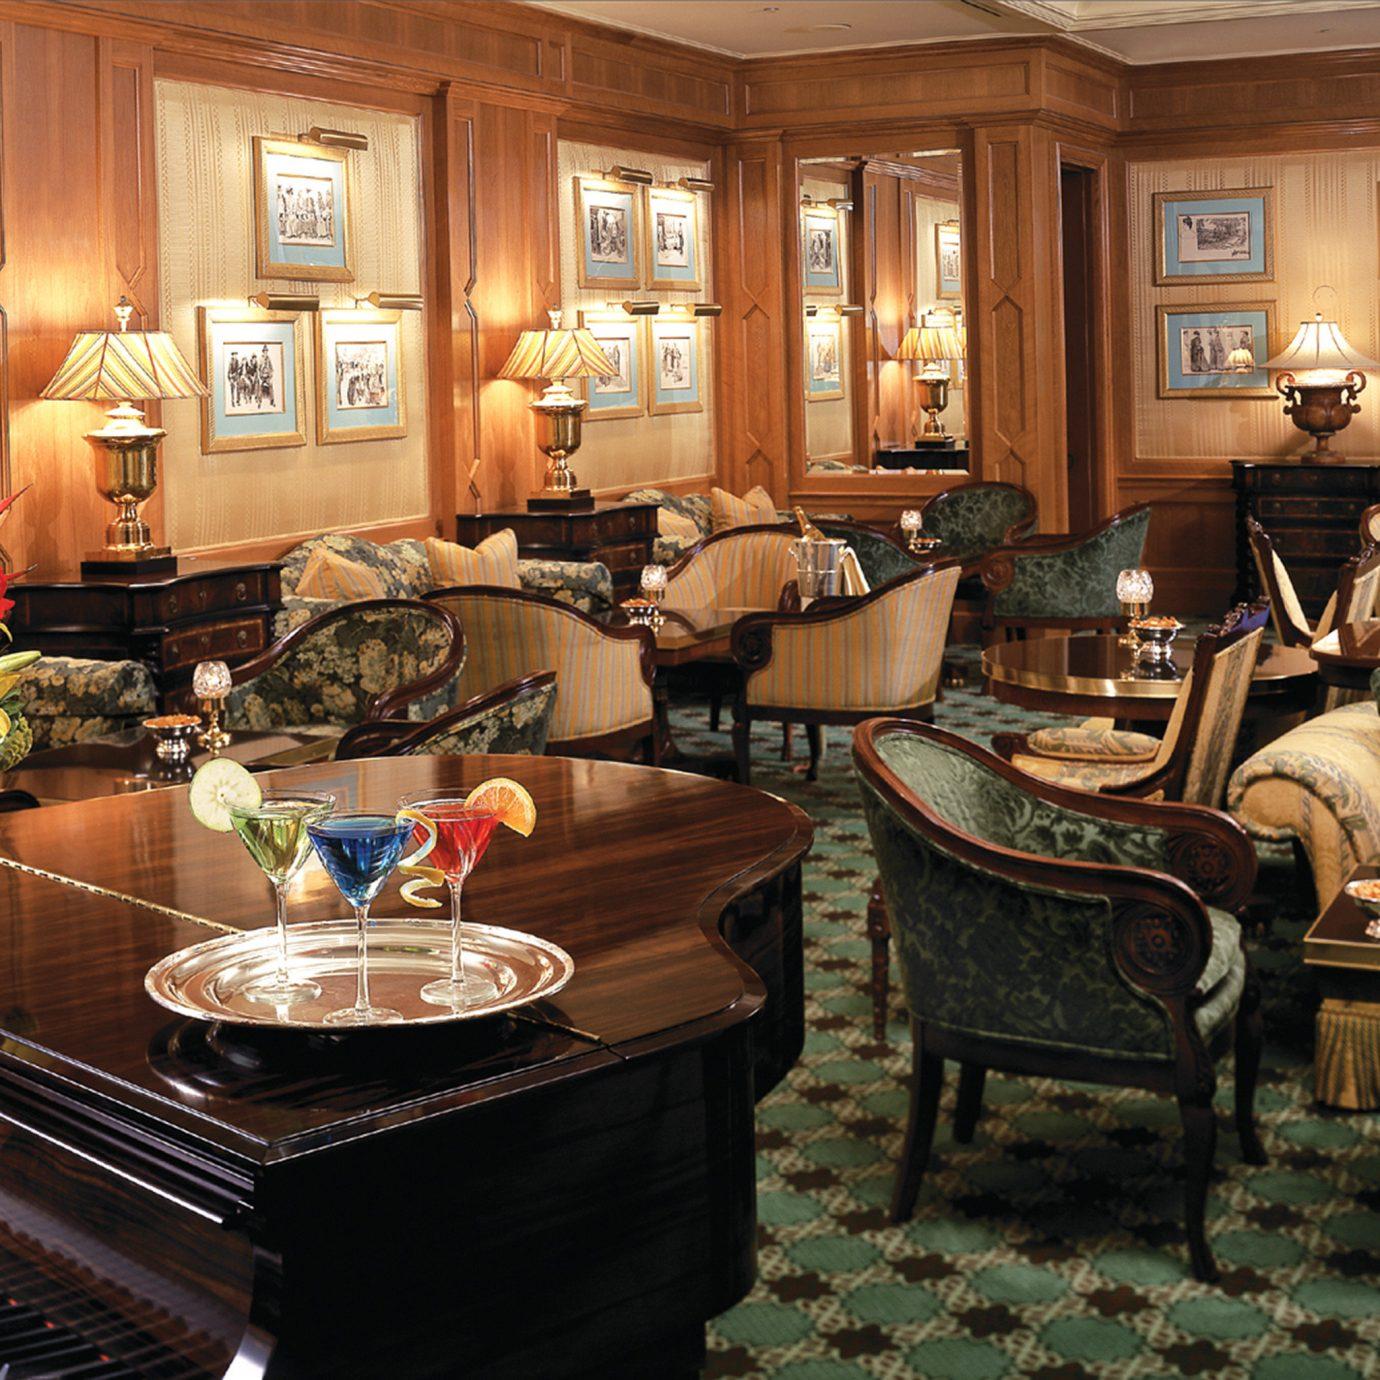 Bar Dining Drink Eat Elegant Fireplace Romantic Lobby living room home restaurant recreation room cluttered